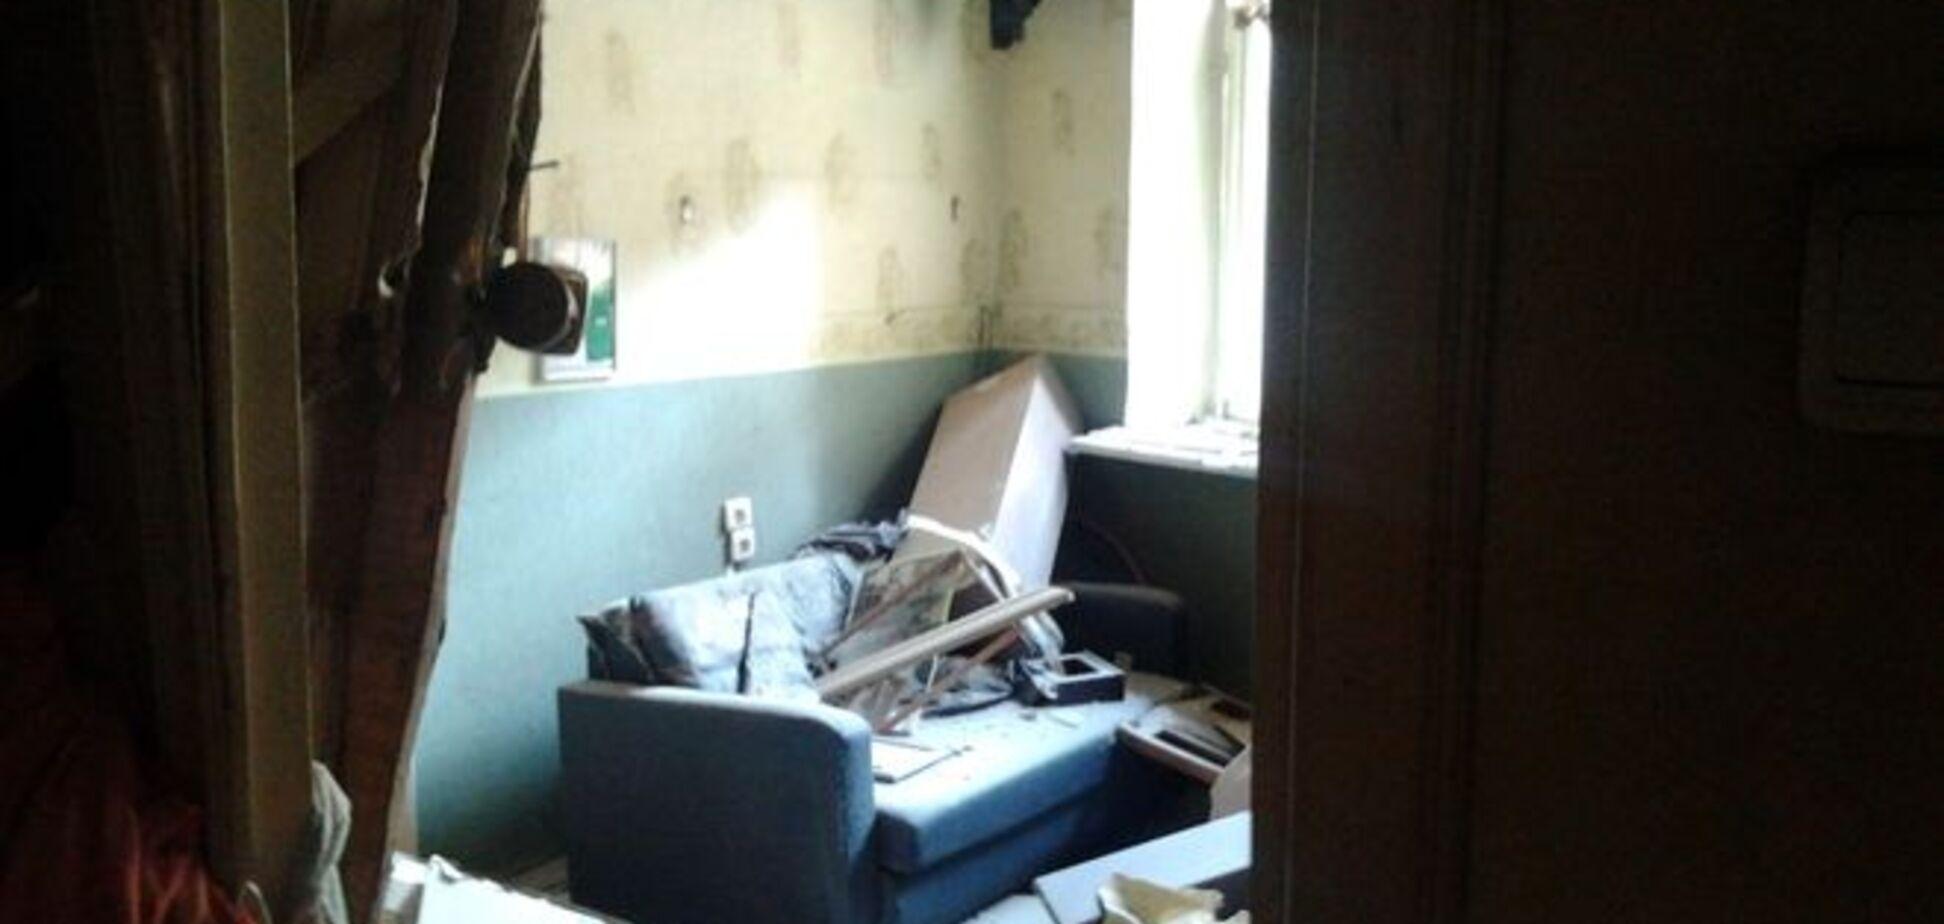 В Краматорске мужчина бросил в квартиру взрывчатку: погибла женщина